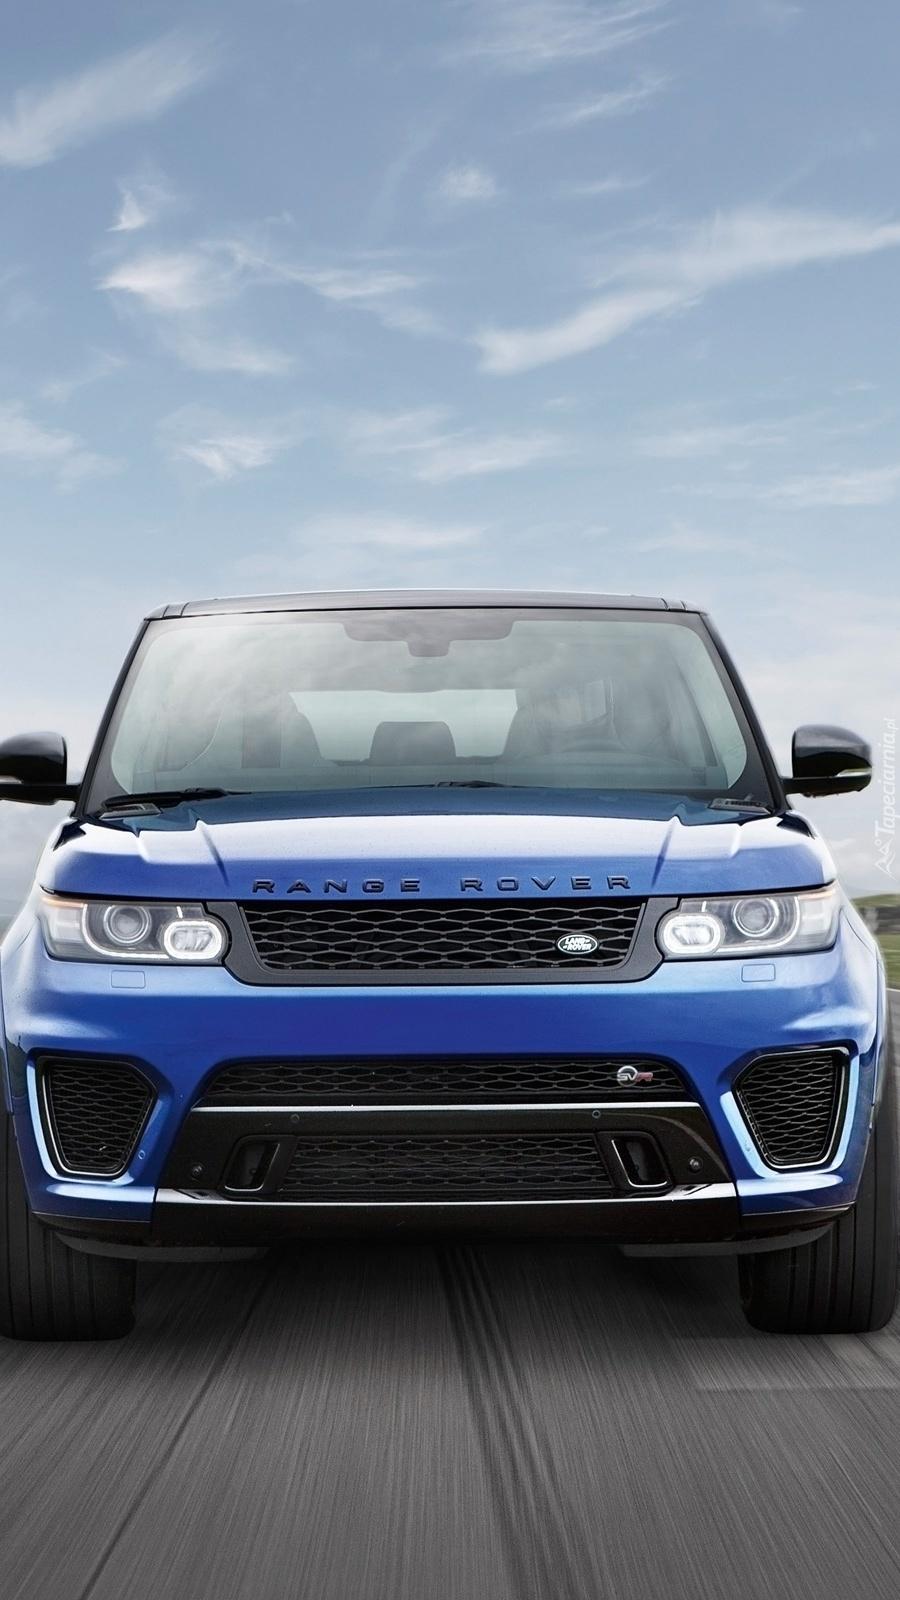 Land Rover na drodze